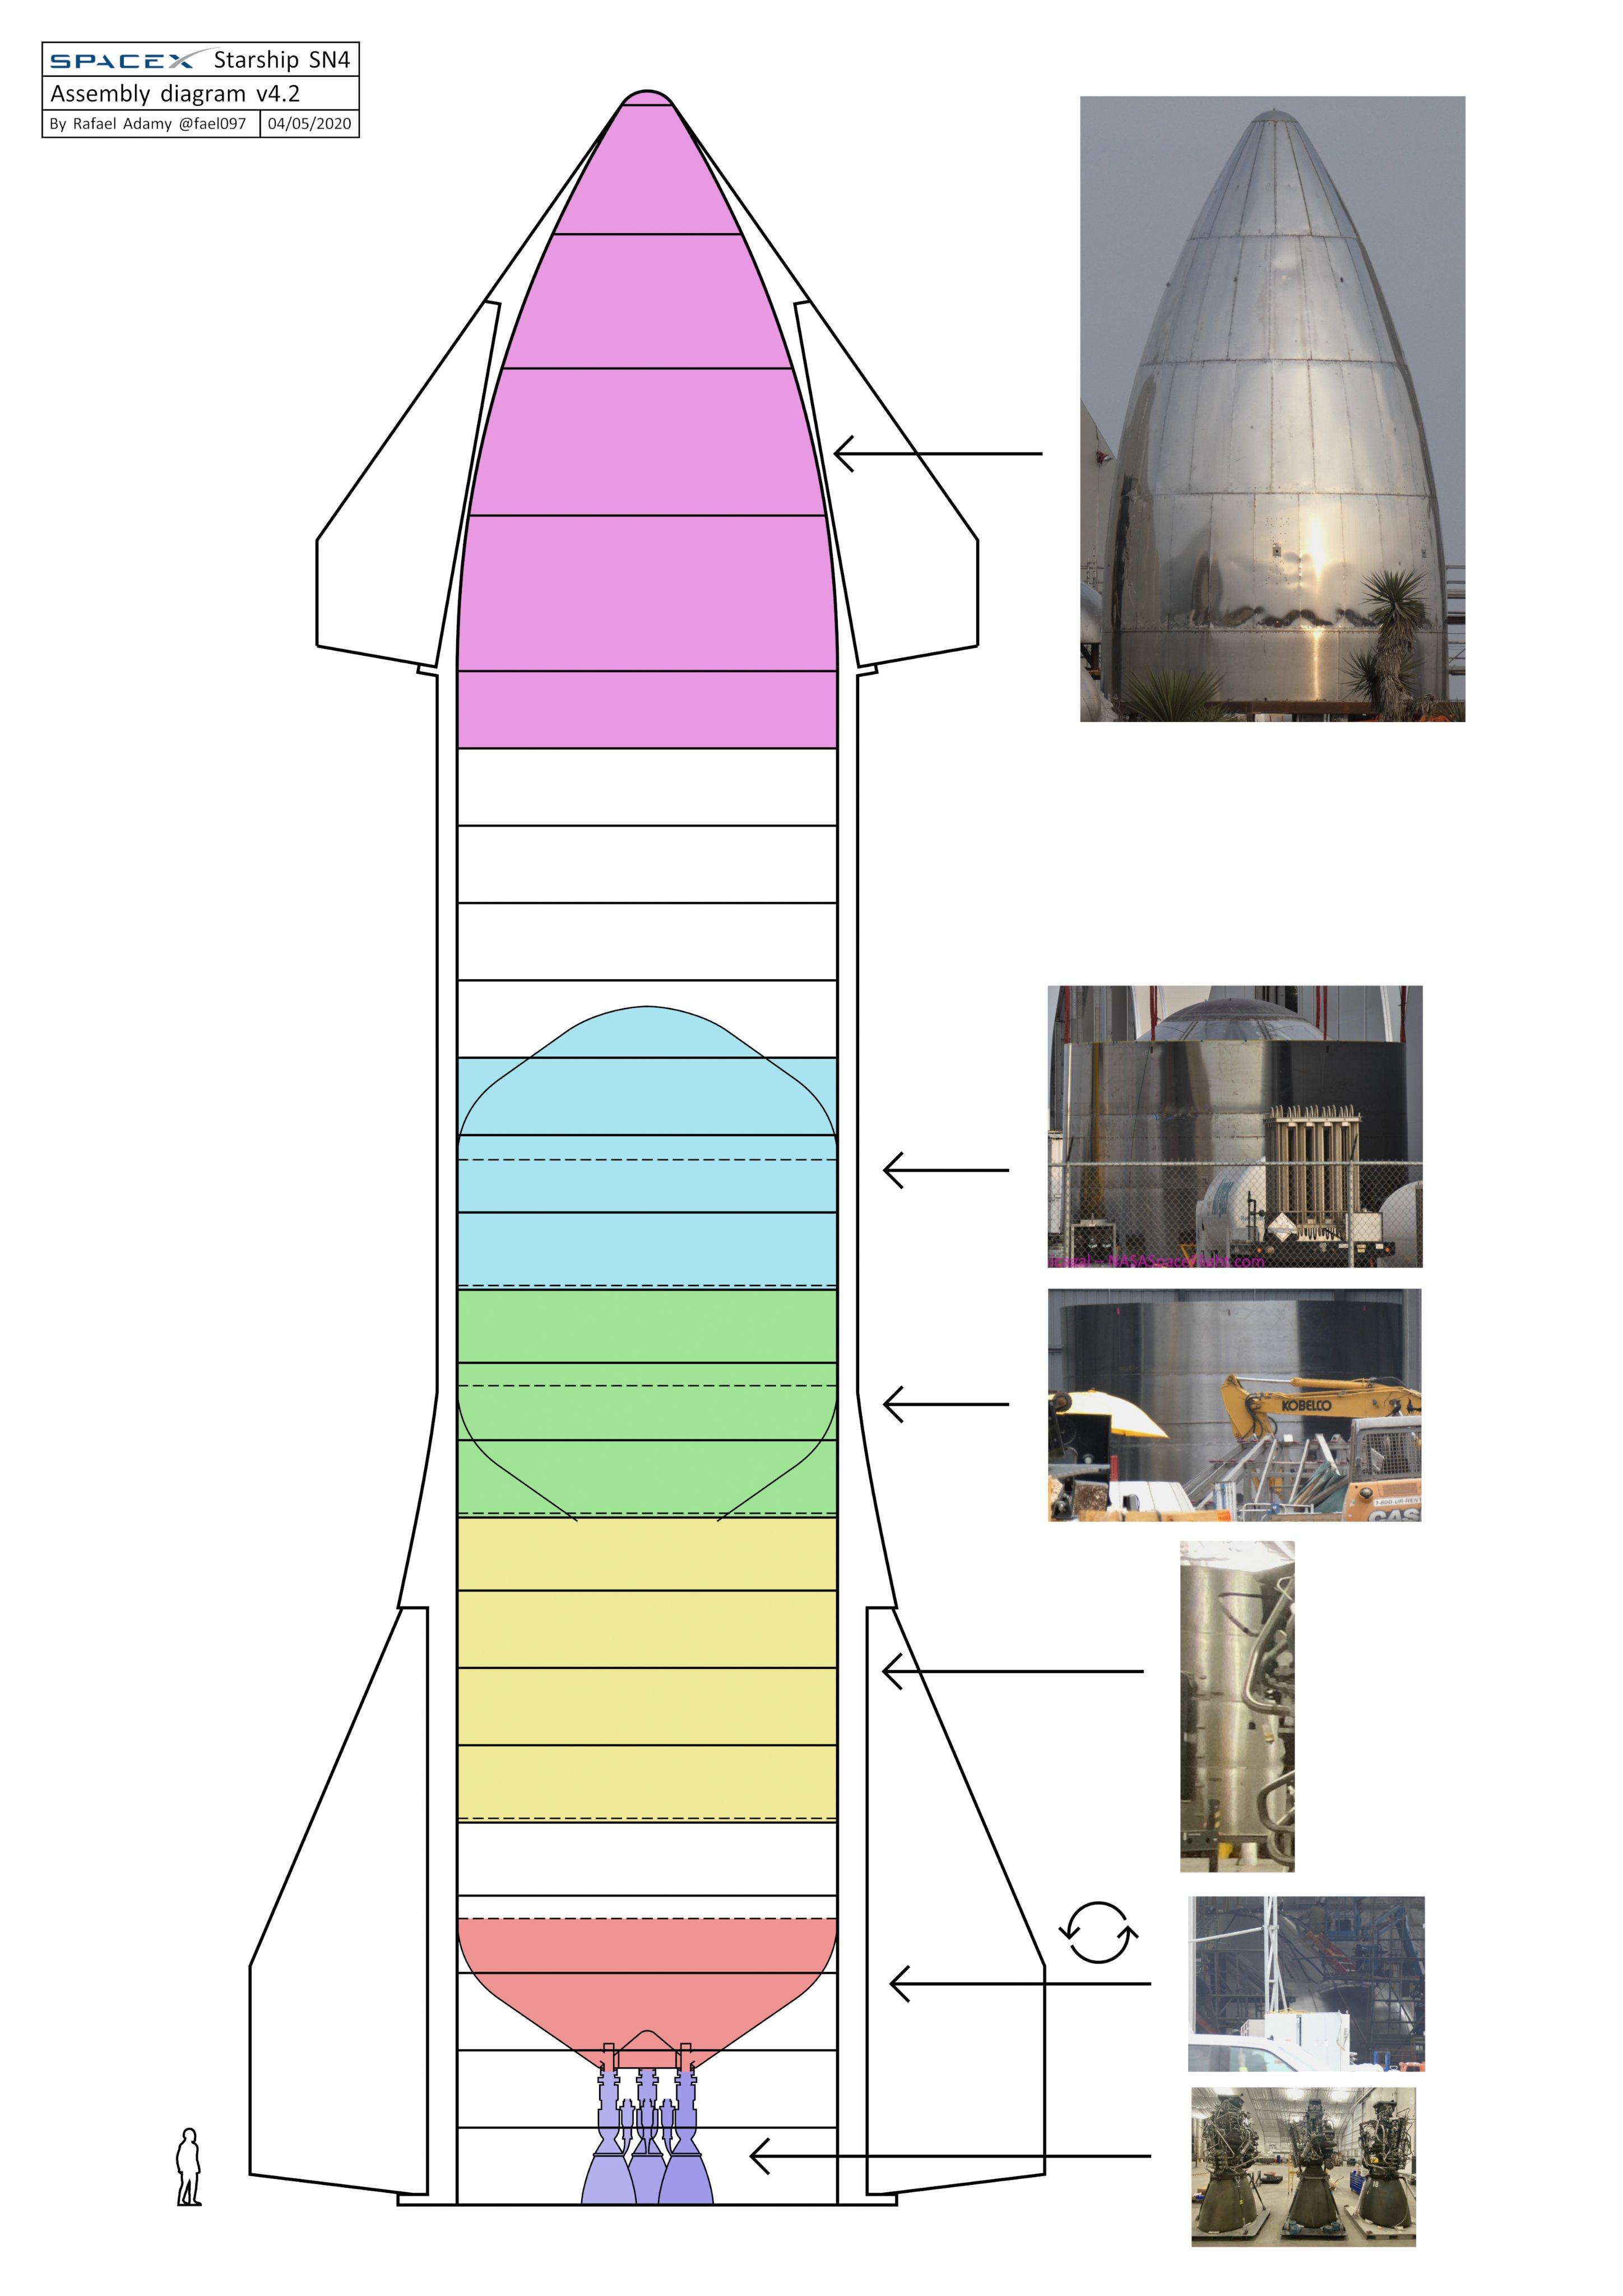 Starship SN4 (Boca Chica) - Page 2 EU3otVtXkAAZWmB?format=jpg&name=4096x4096